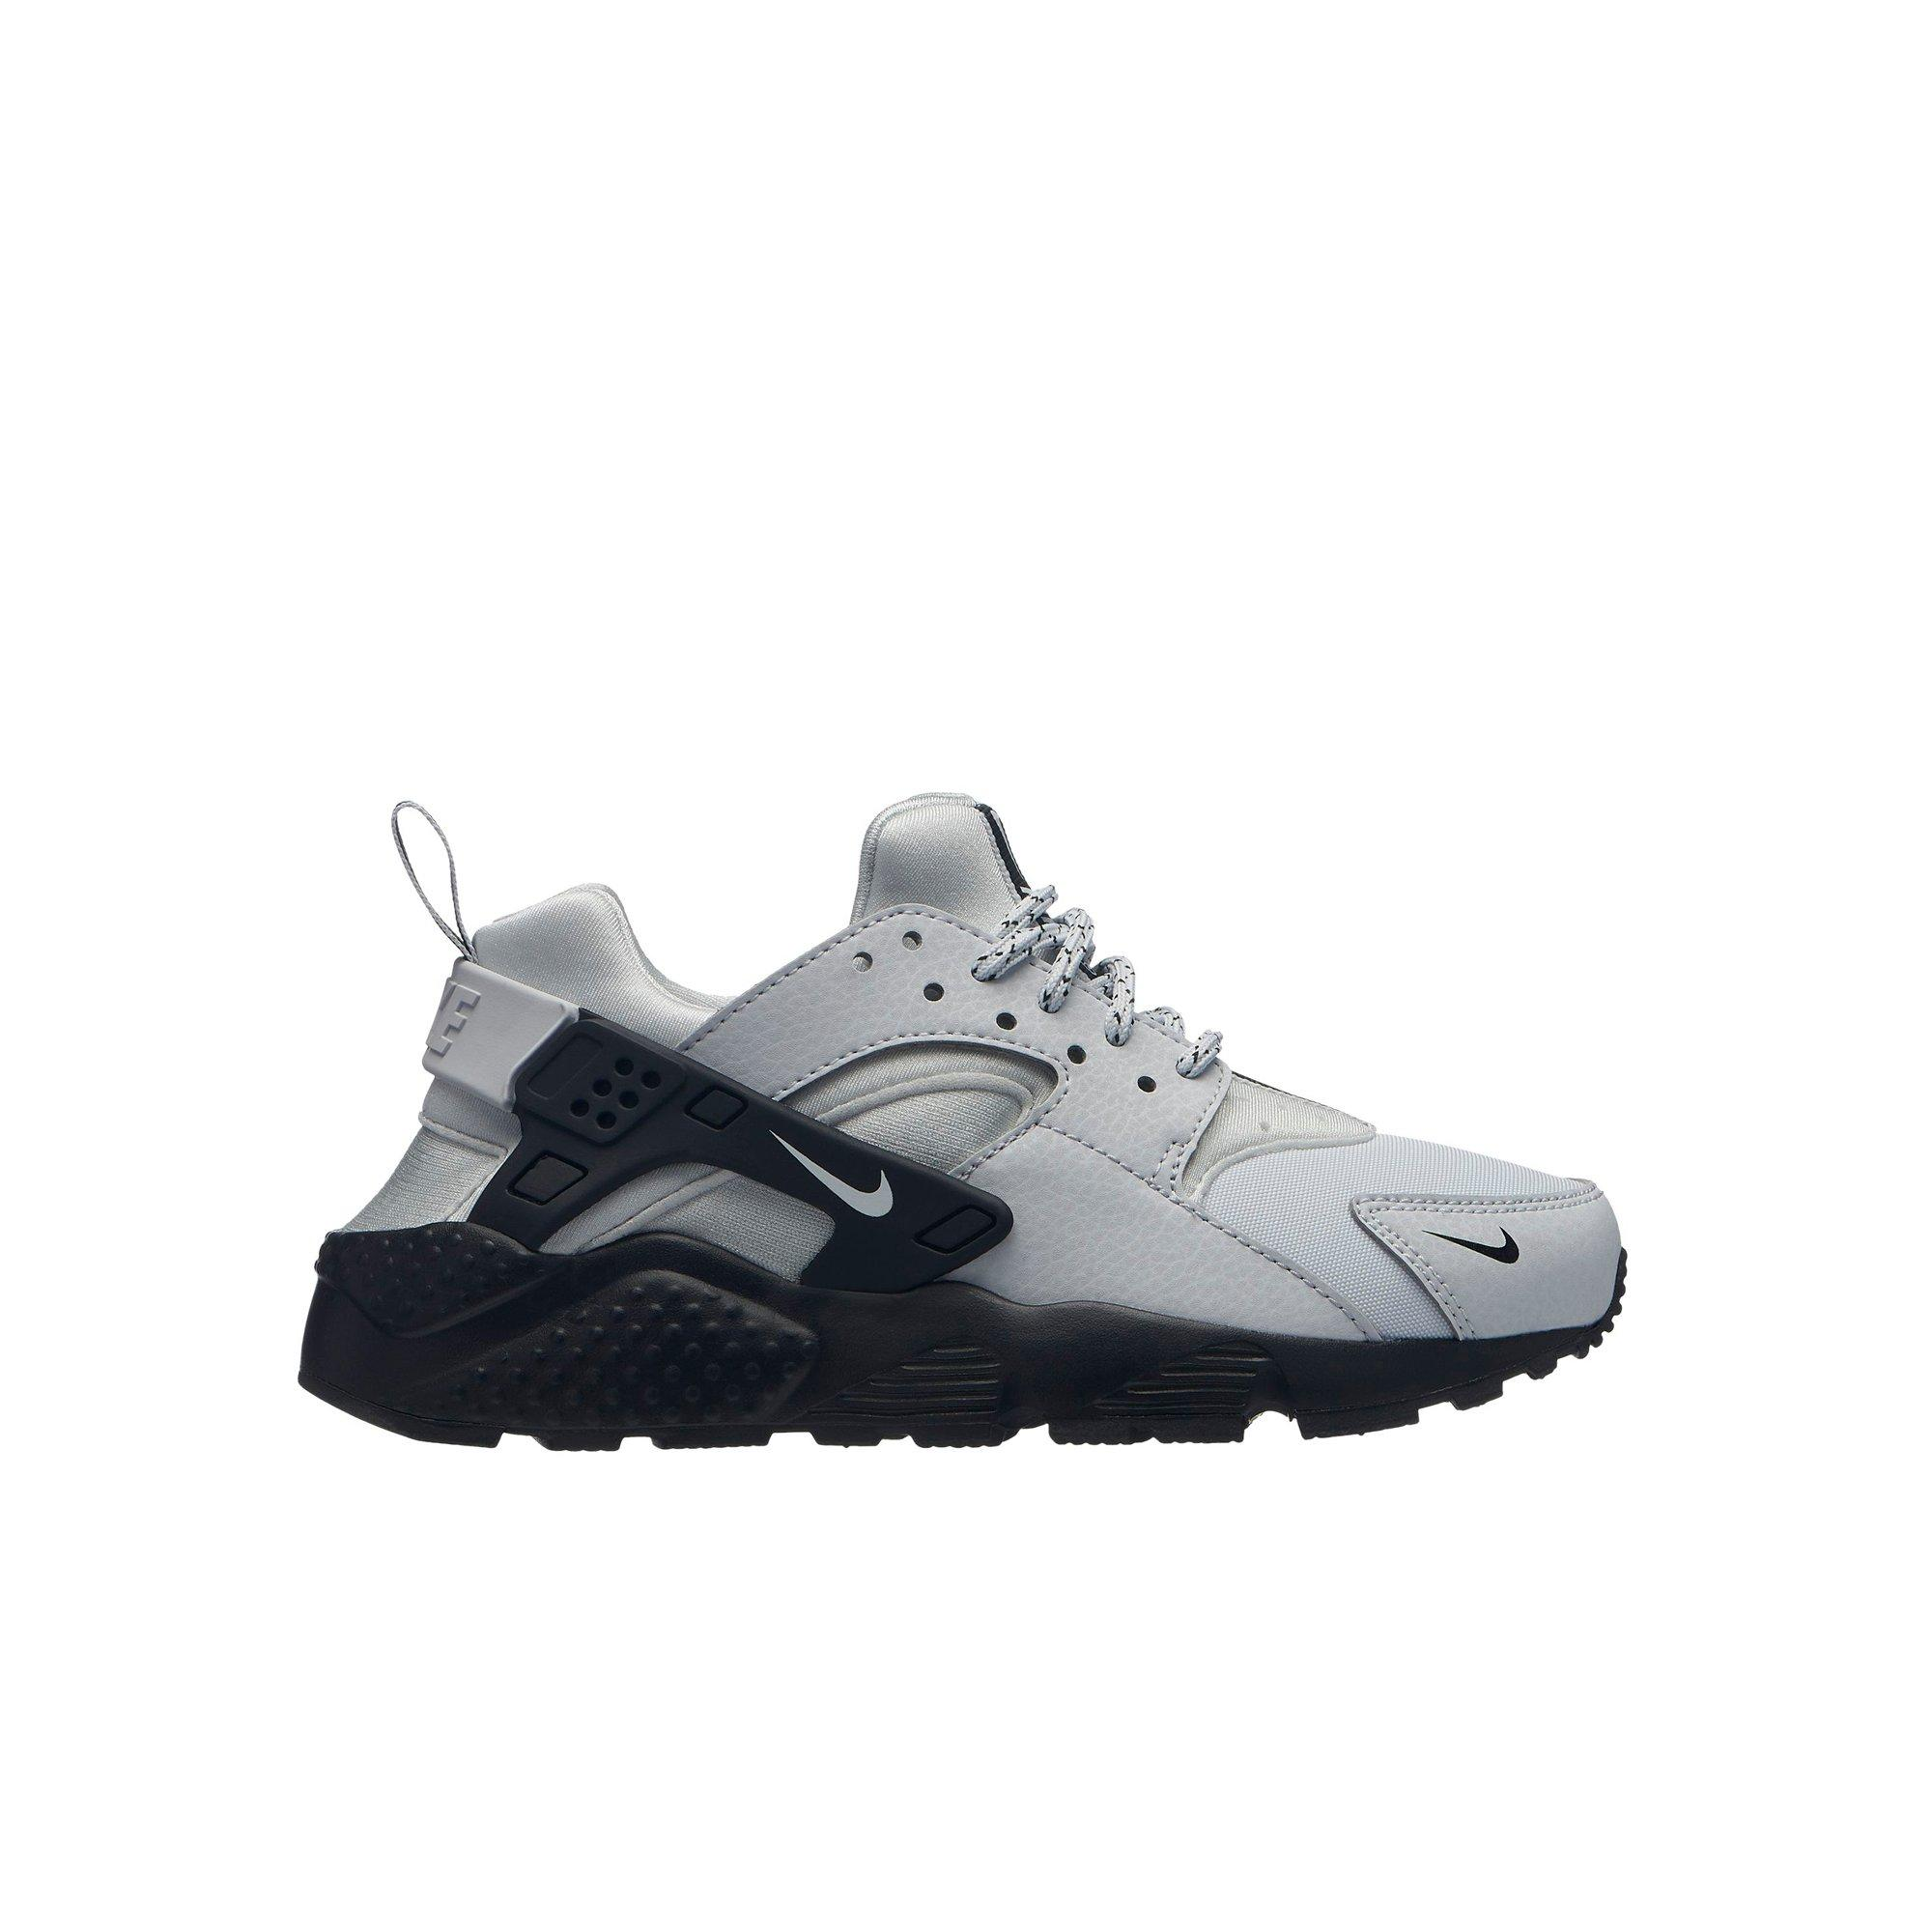 timeless design 730a4 da57e black and grey huarache running shoes